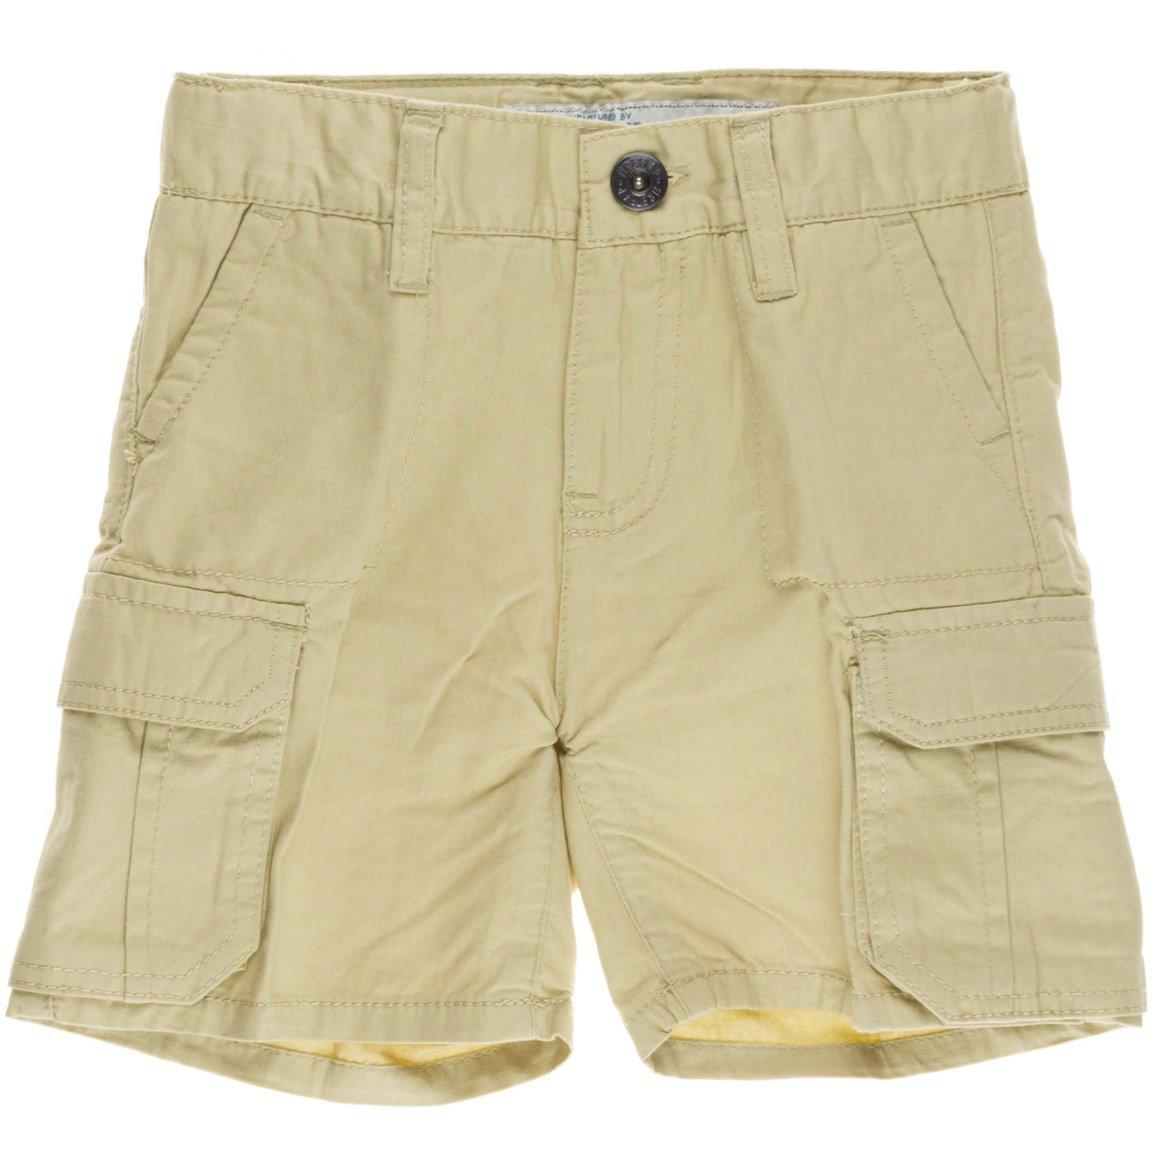 Firetrap παιδικό παντελόνι βερμούδα «Scanty»